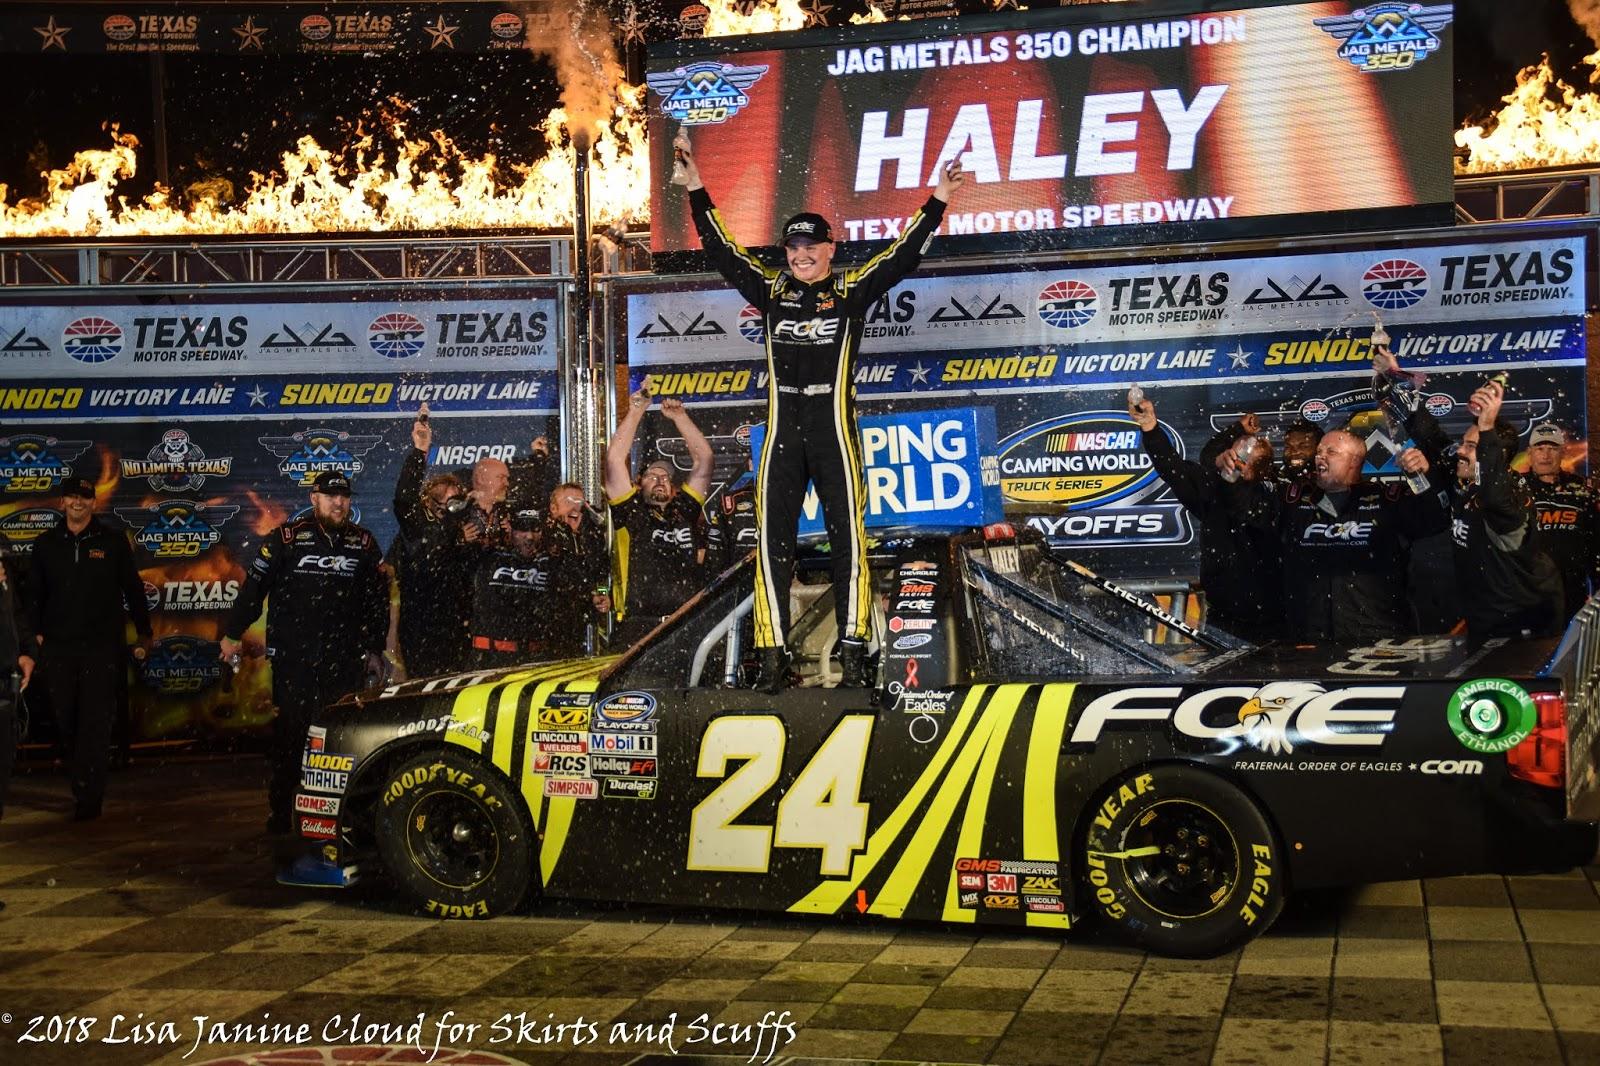 Todd Gilliland comes up short on fuel, Justin Haley grabs win at